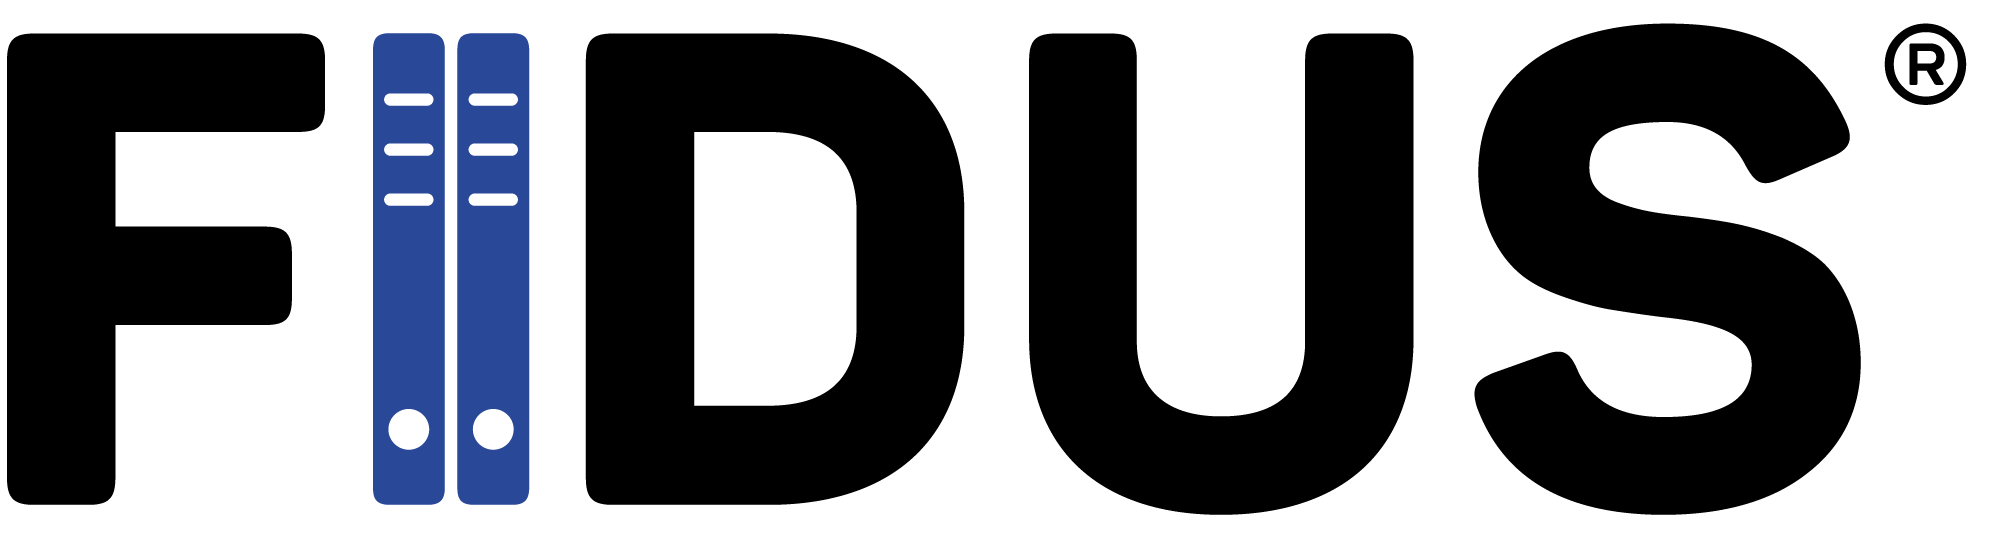 fidus_logo_RGB